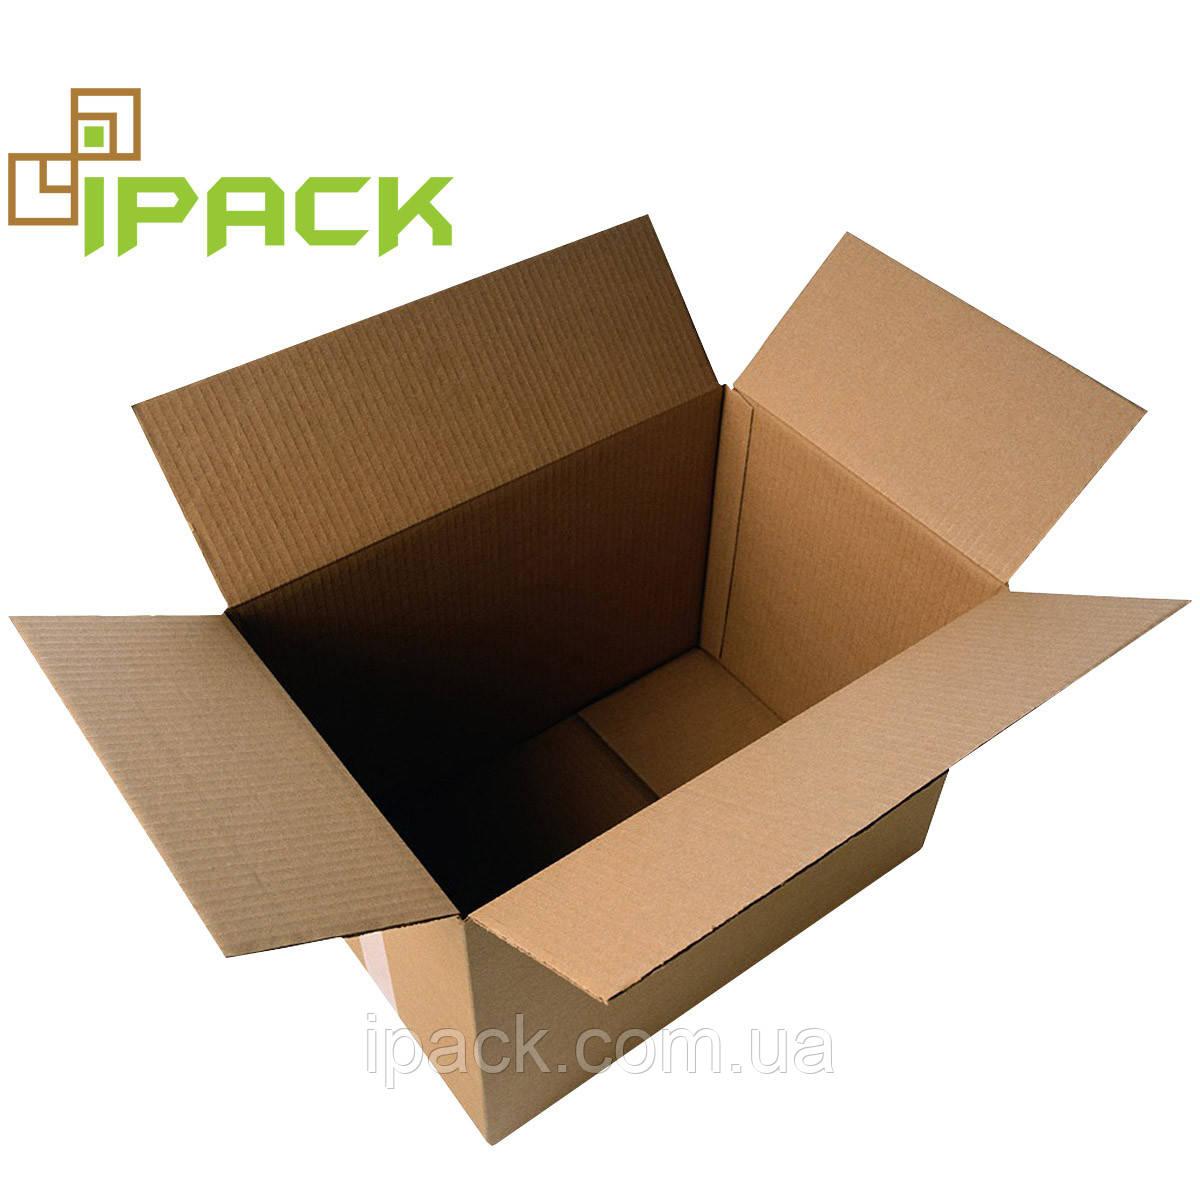 Гофроящик 390*390*340 мм бурий четырехклапанный картонний короб